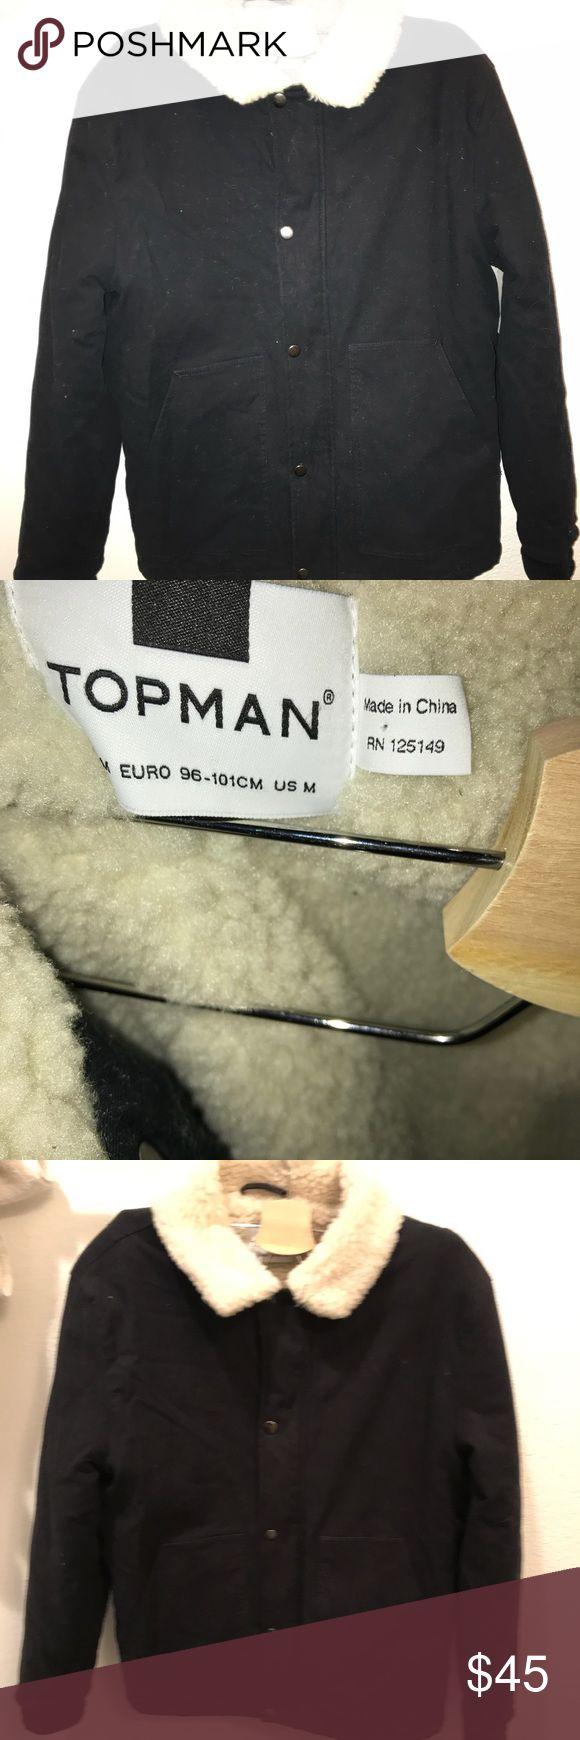 Topman jacket Black button up Topman jacket men's size M NWT Topman Jackets & Coats